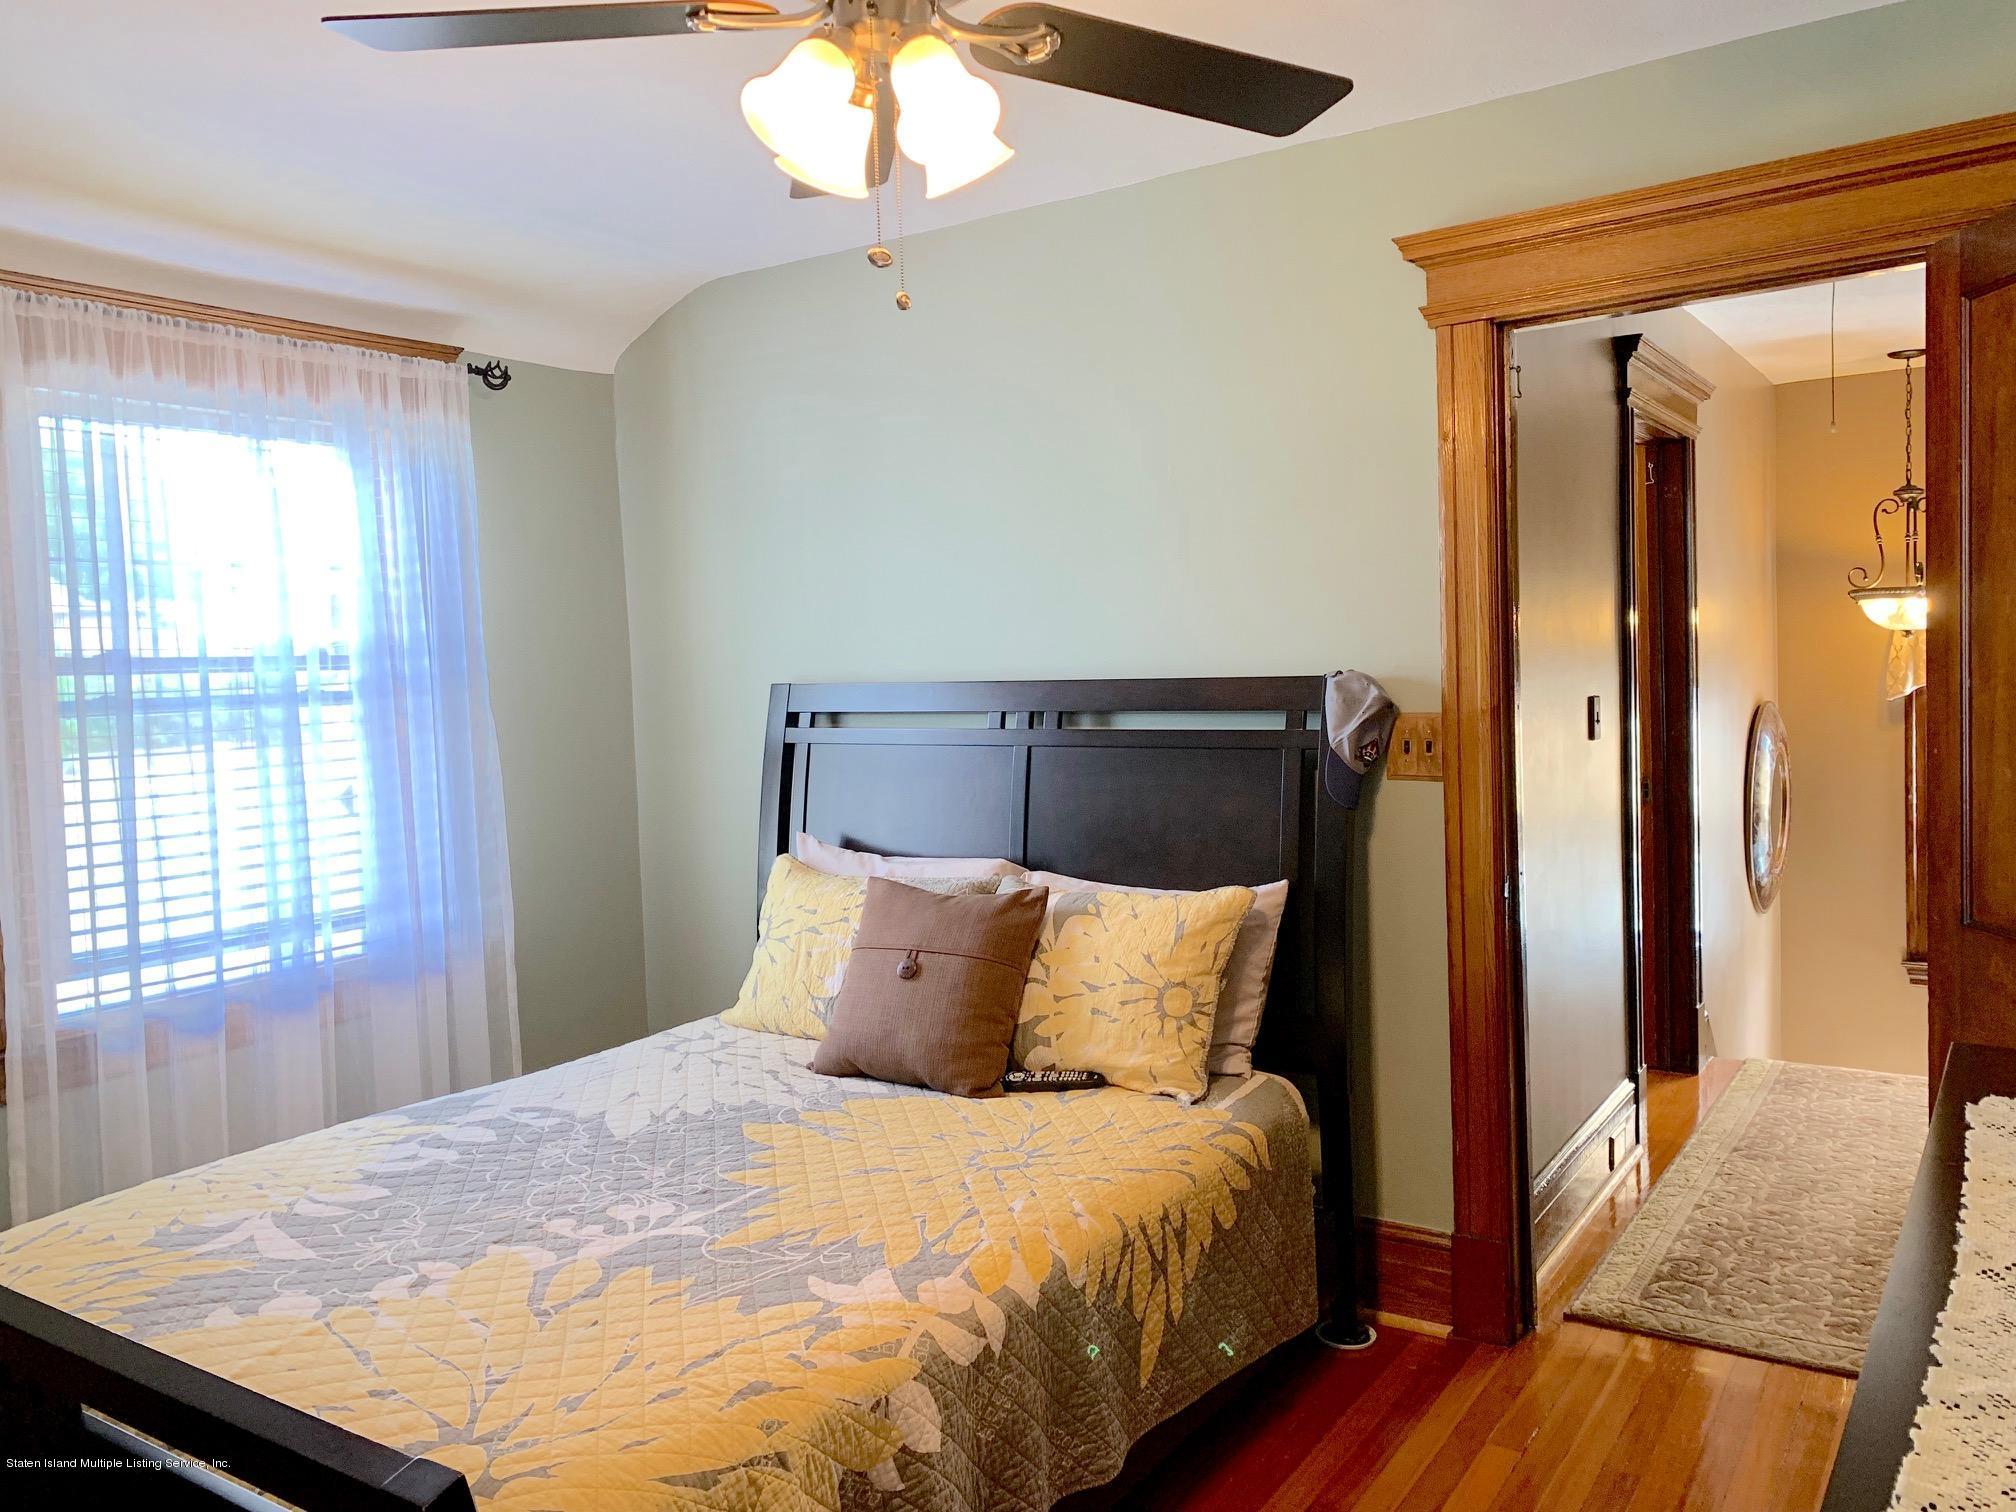 Single Family - Detached 195 Fairview Avenue  Staten Island, NY 10314, MLS-1132423-30